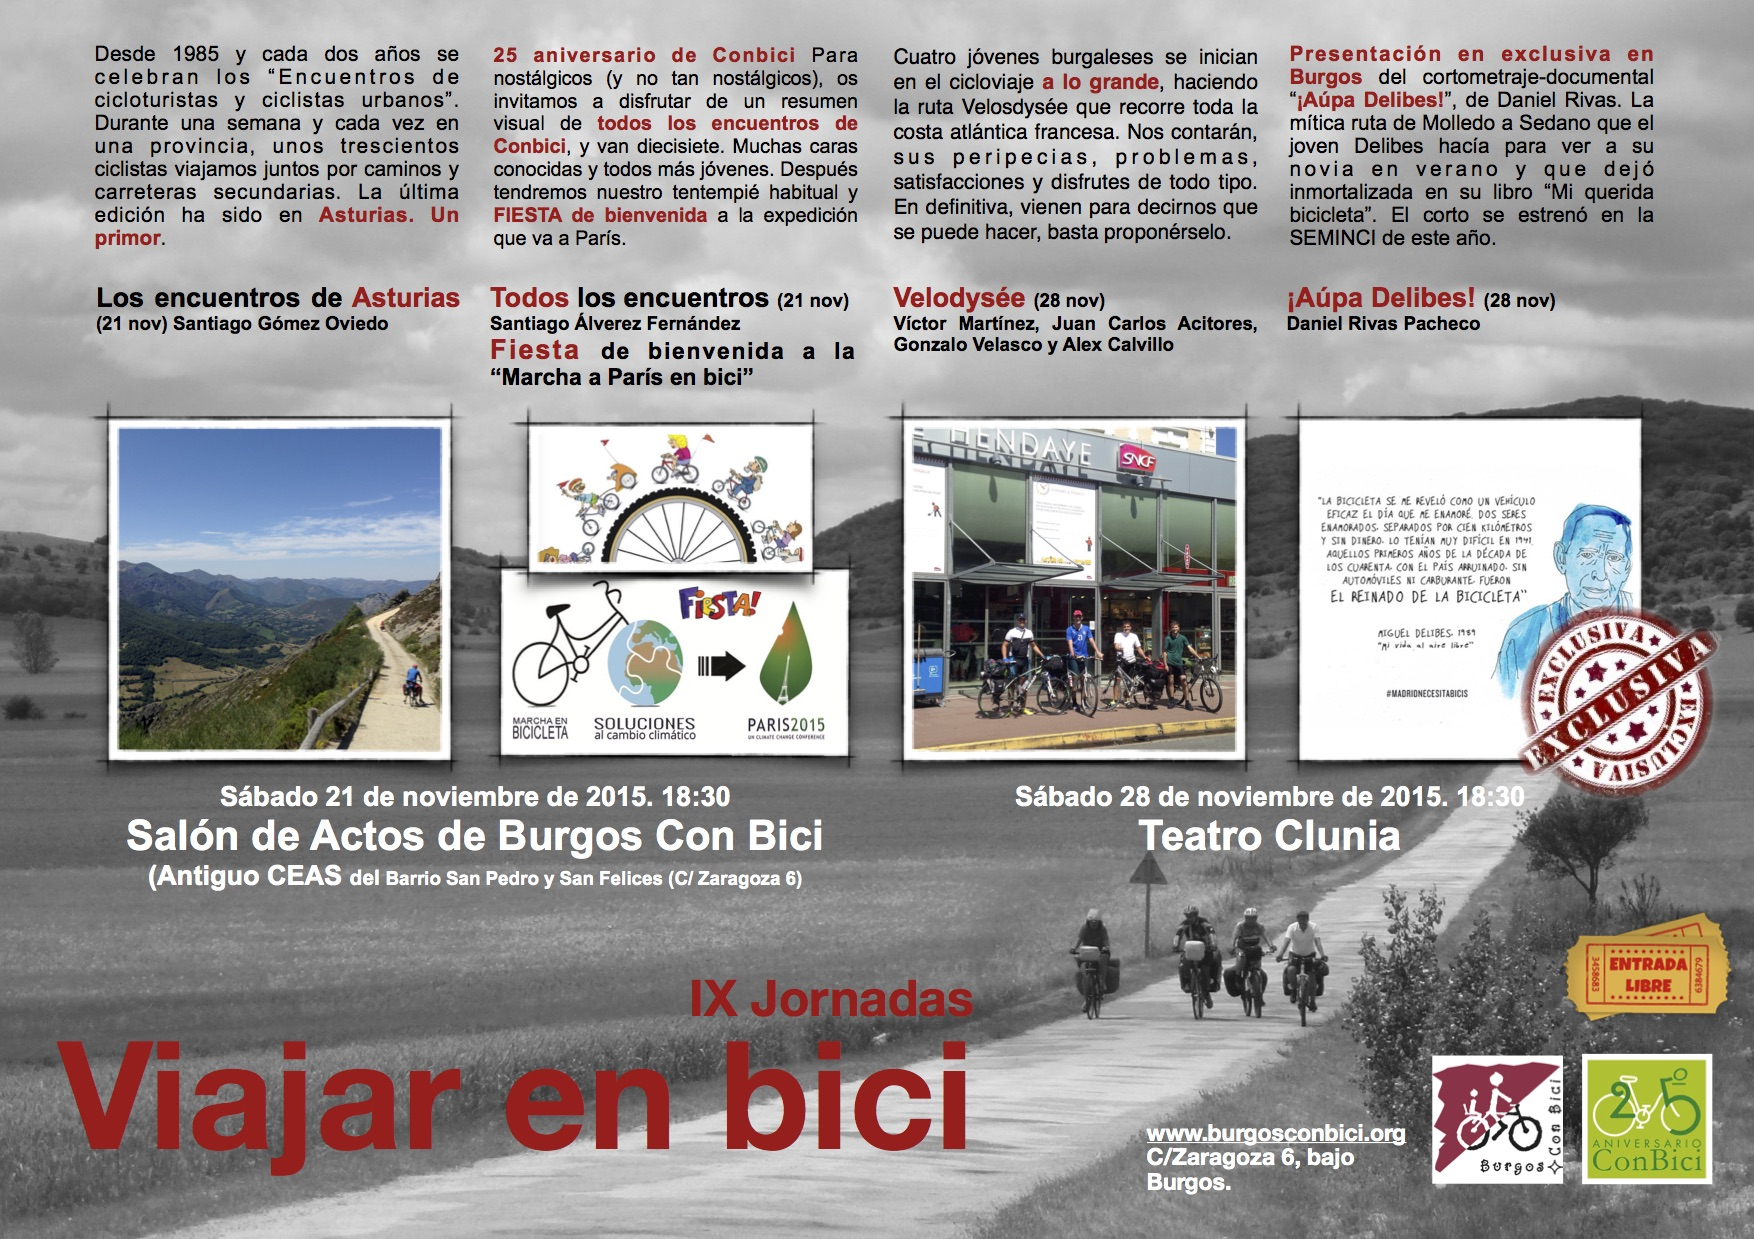 Viajes en bici